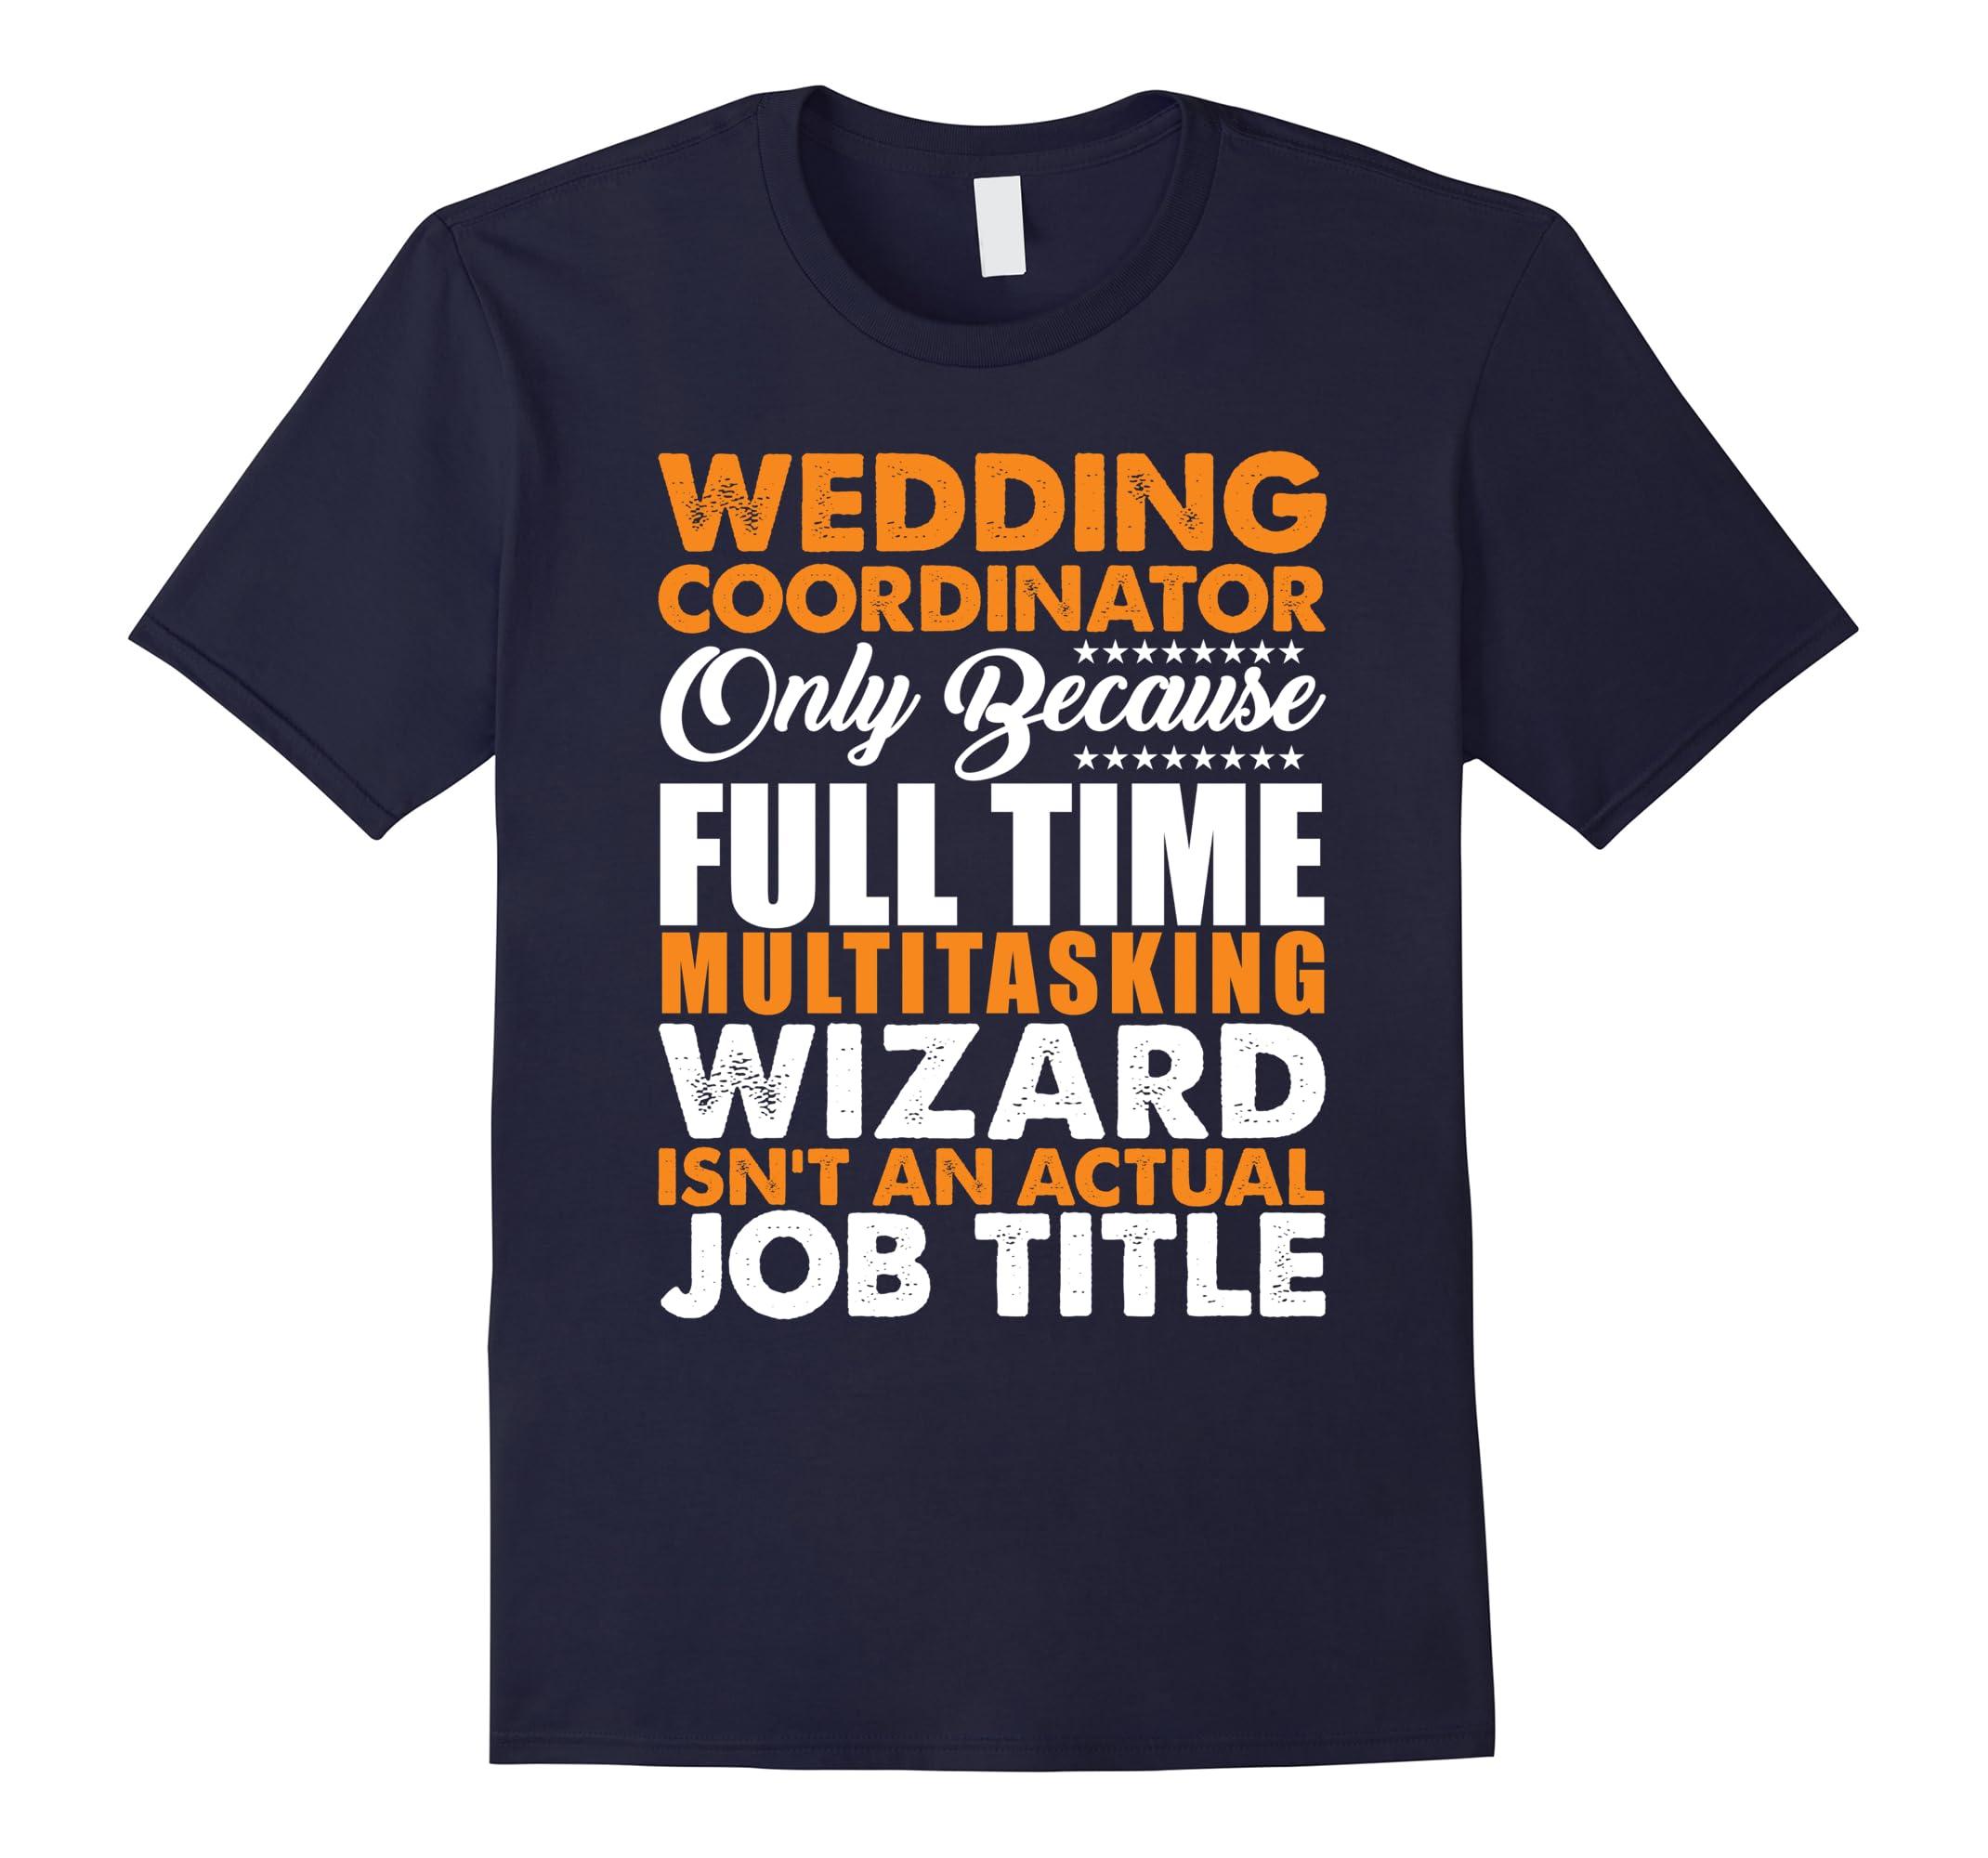 Wedding Coordinator Is Not An Actual Job Title Funny T-Shirt-RT